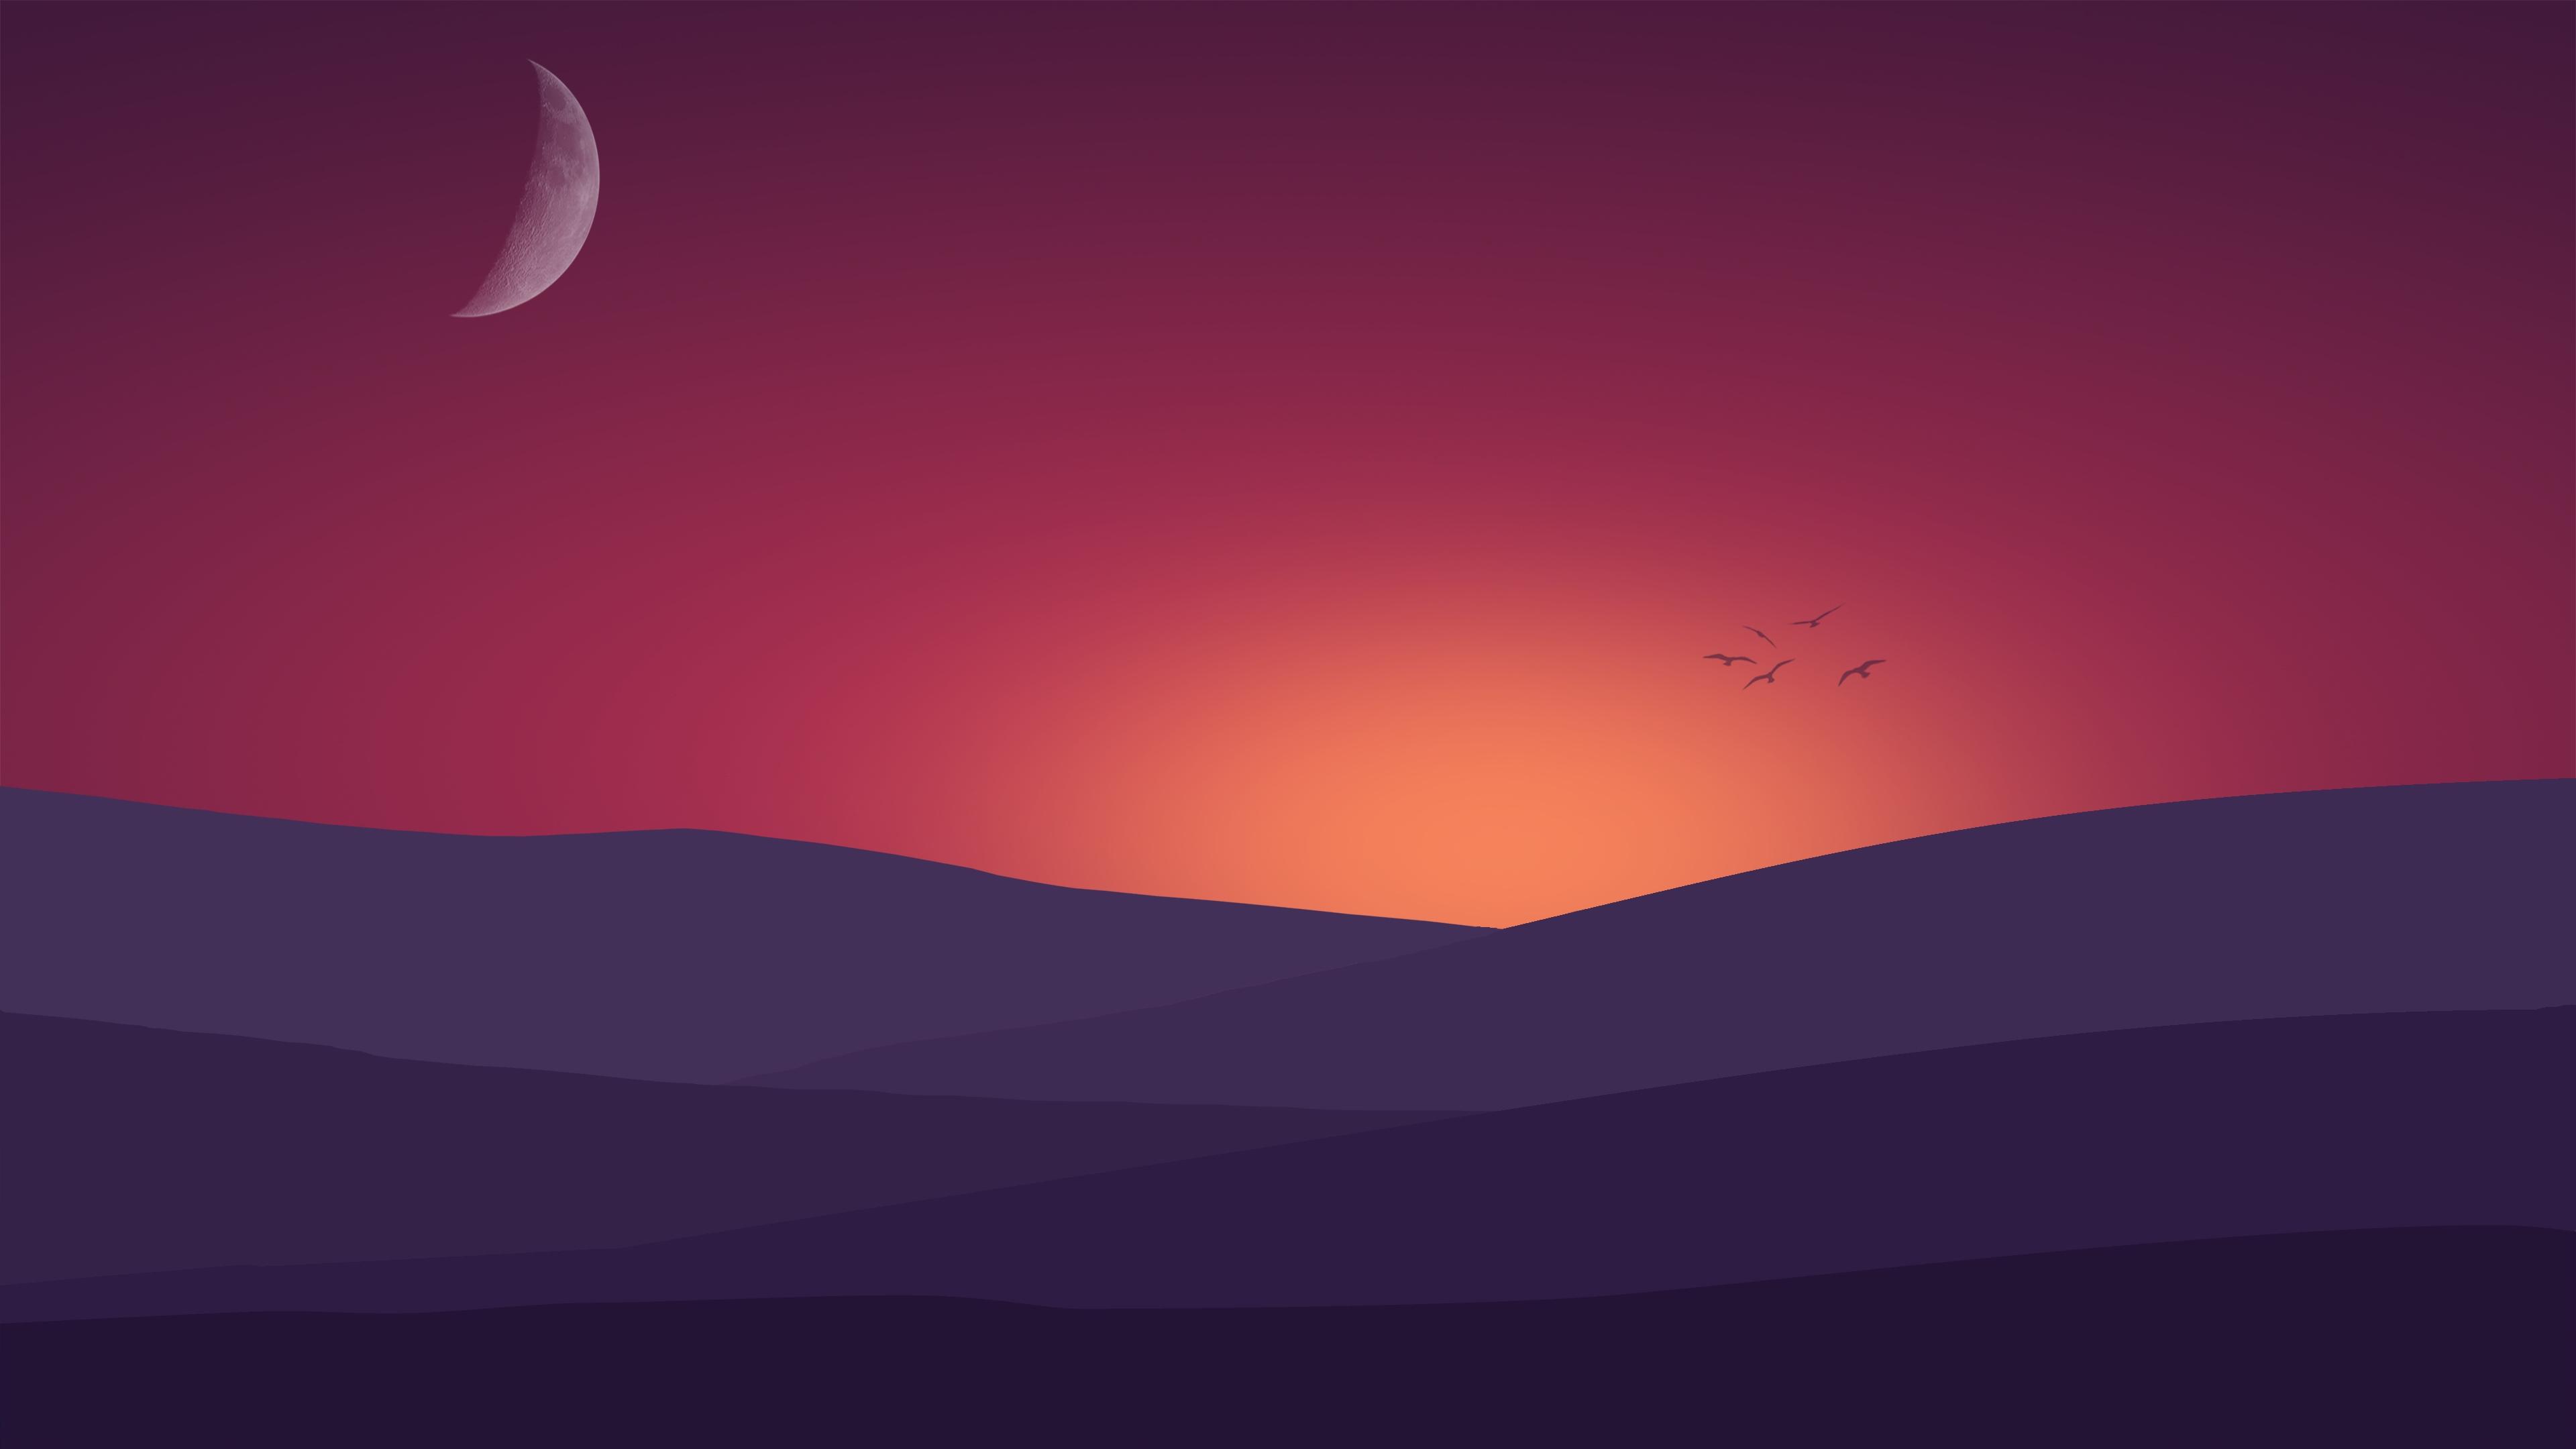 birds flying towards sunset landscape minimalist 4k 1540756204 - Birds Flying Towards Sunset Landscape Minimalist 4k - sunset wallpapers, minimalist wallpapers, minimalism wallpapers, landscape wallpapers, hd-wallpapers, digital art wallpapers, birds wallpapers, artwork wallpapers, artist wallpapers, 4k-wallpapers